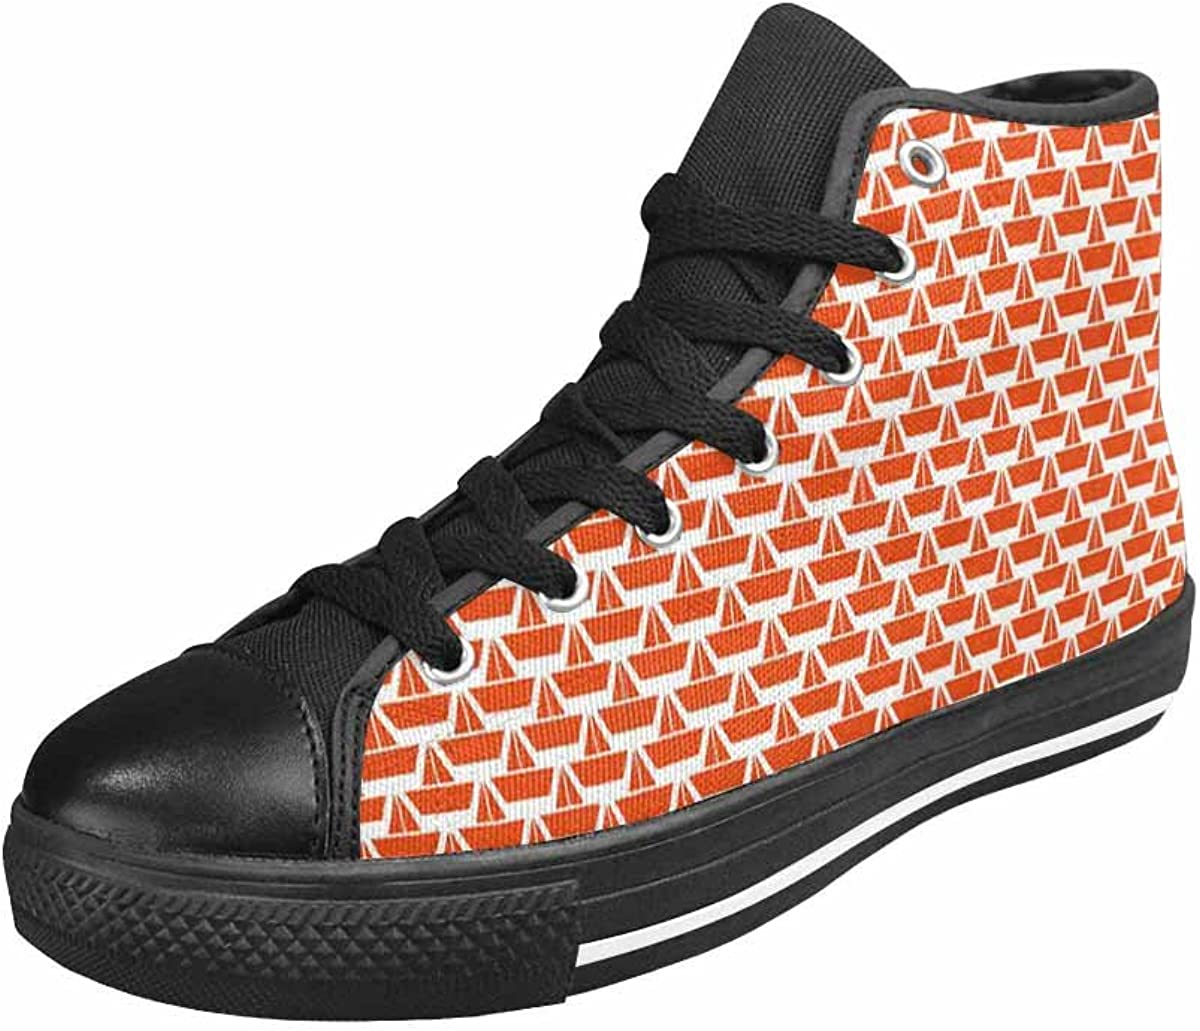 MingDe Sports High Top Canvas Shoes Unisex Canvas Sneaker